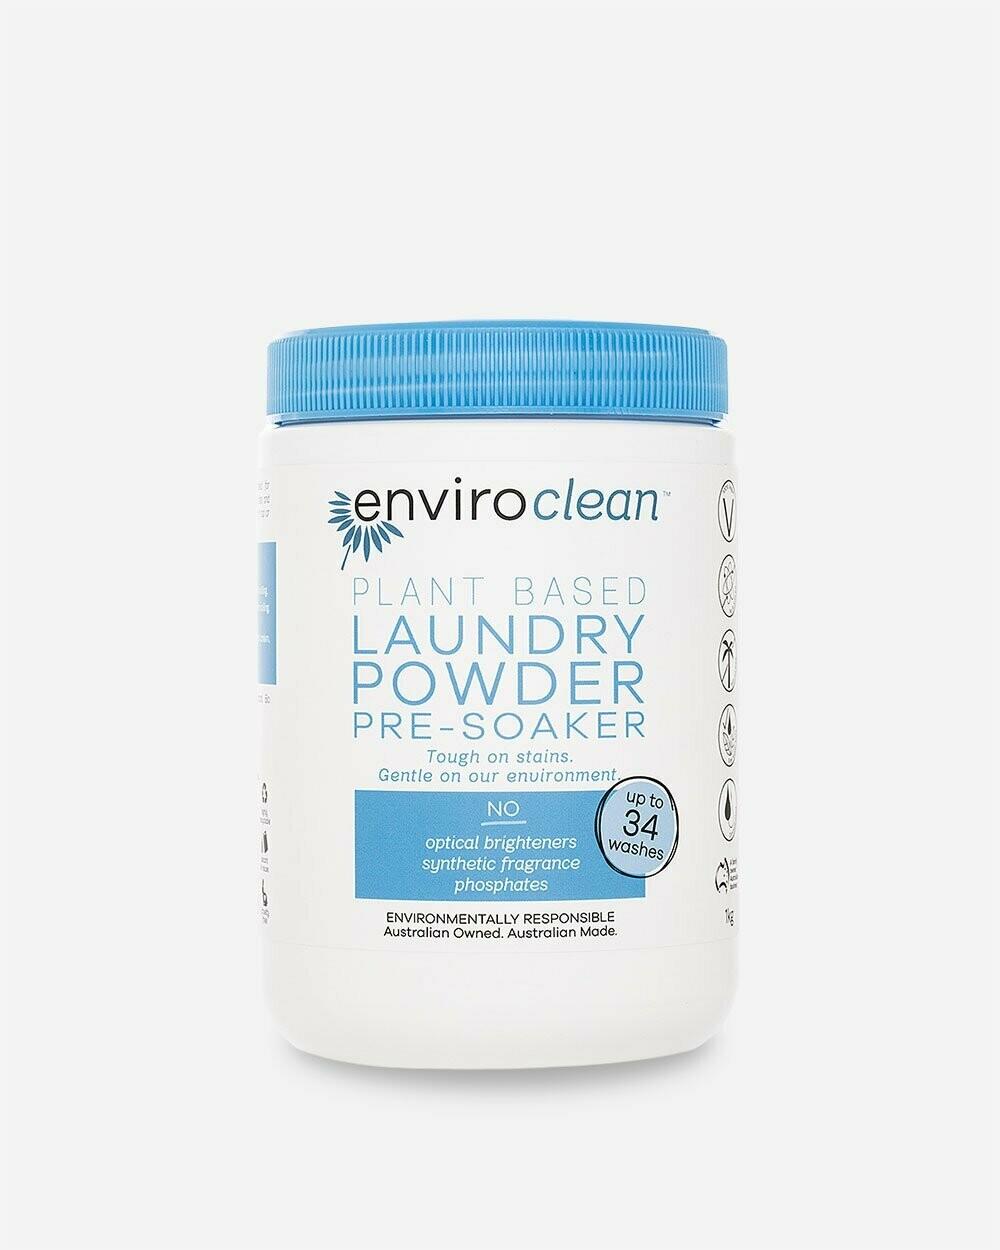 Enviroclean Plant Based Laundry Powder & Pre-soaker